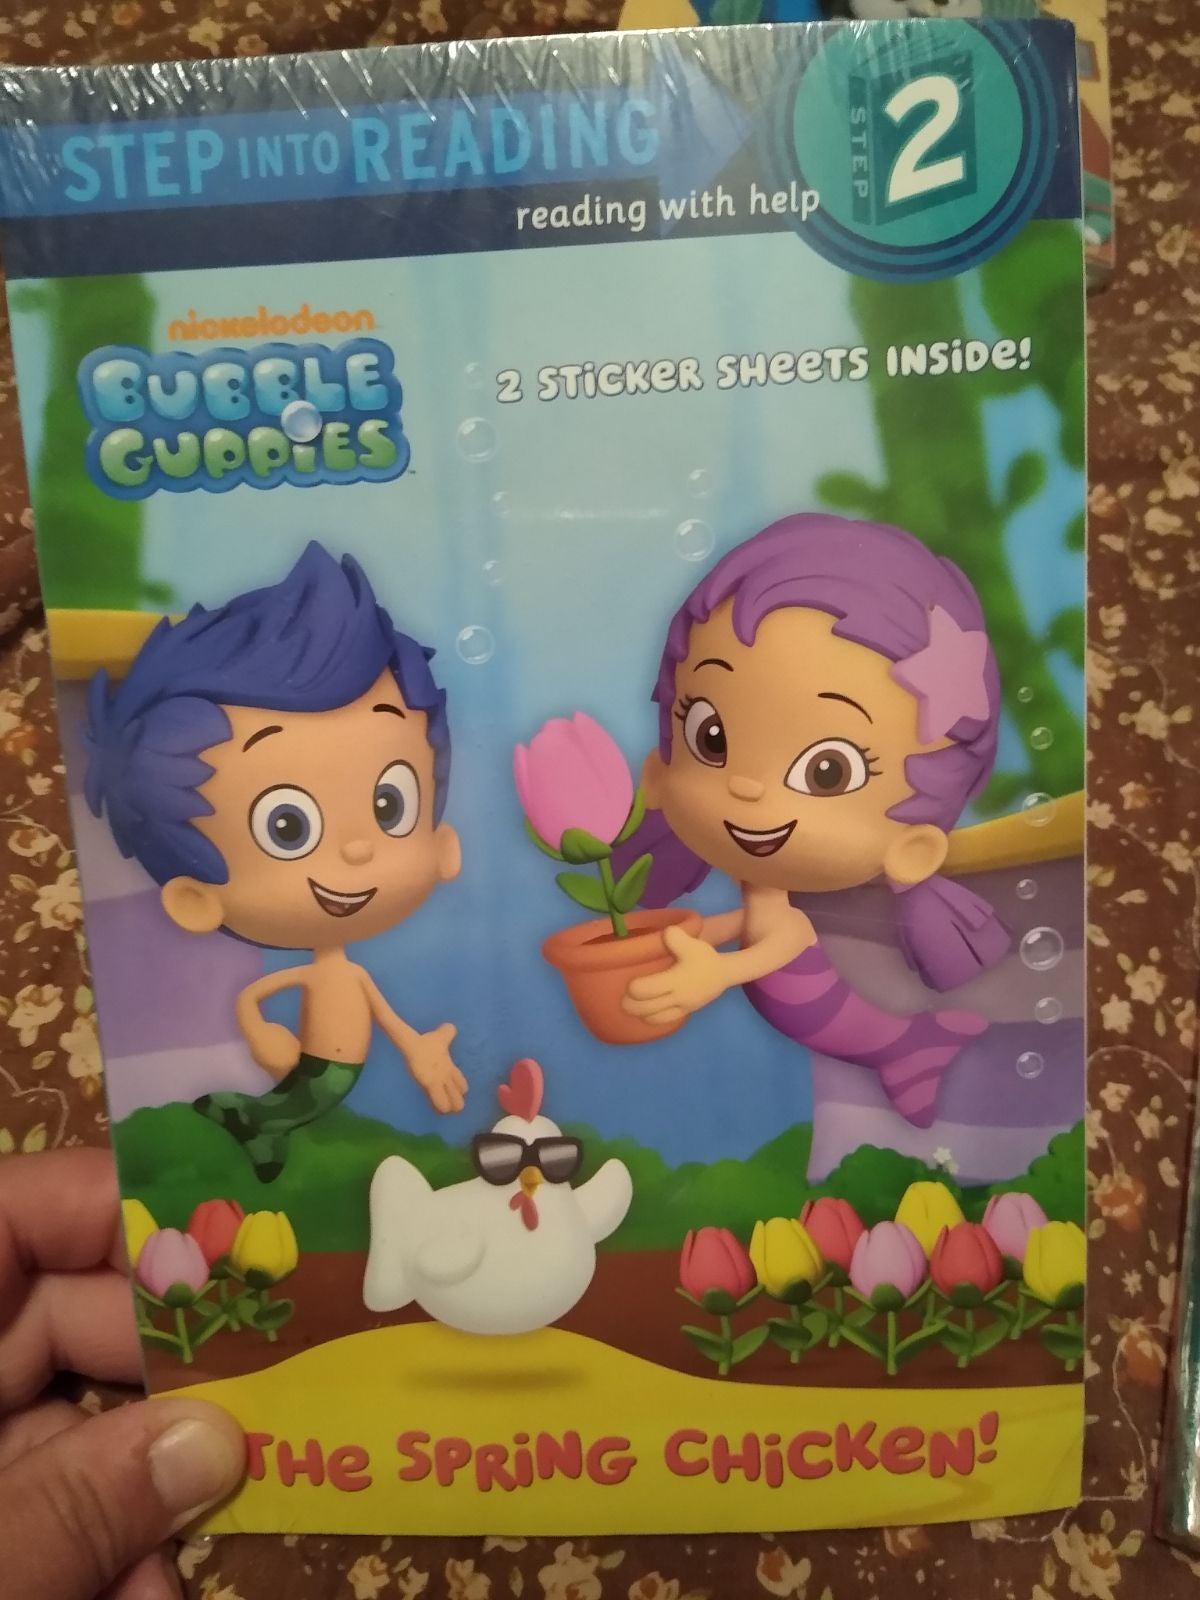 Bubble guppies books